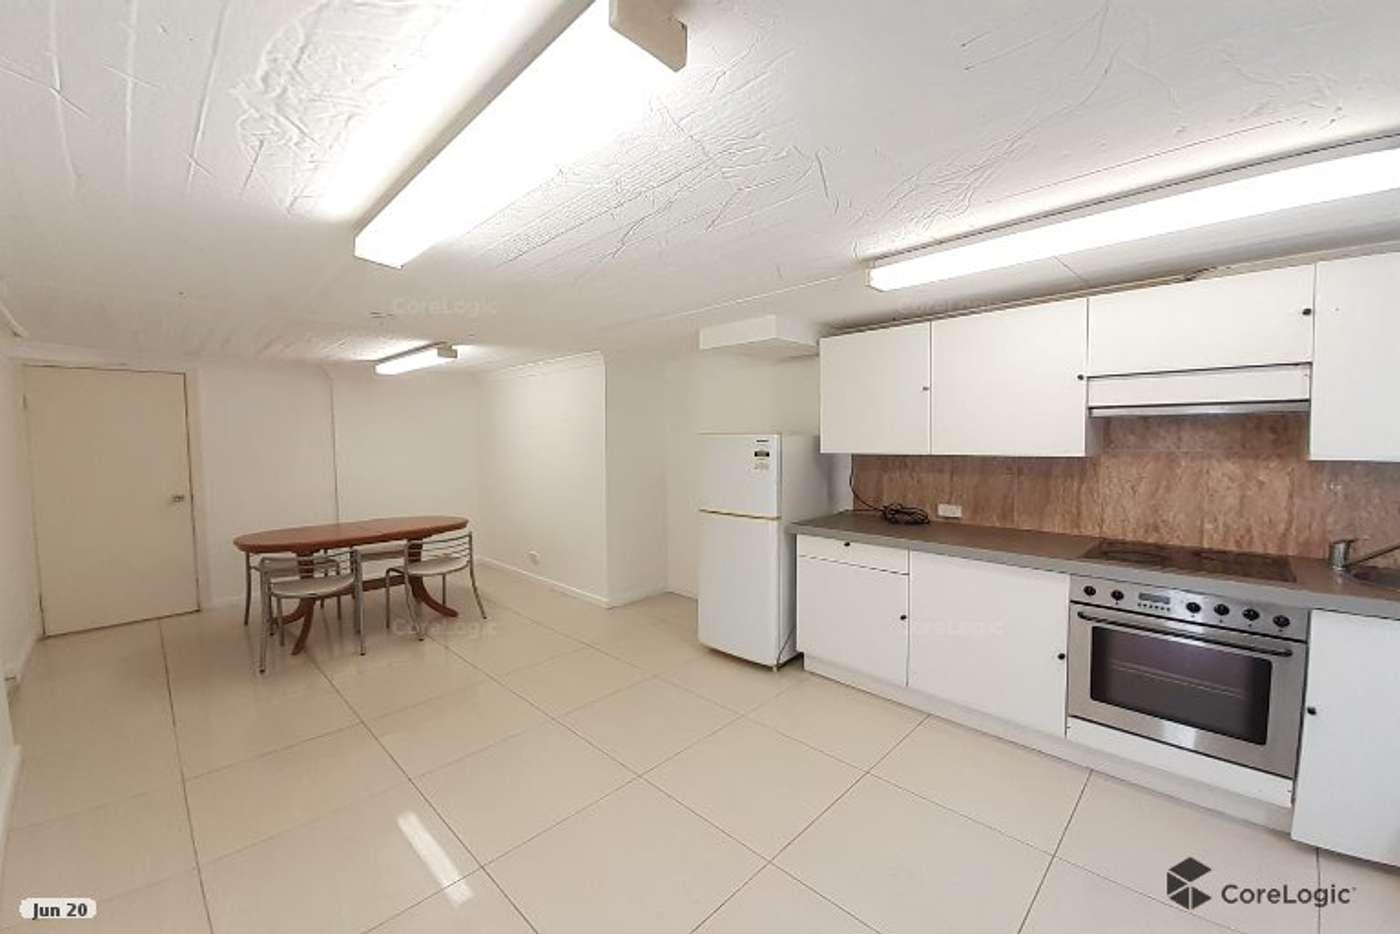 Main view of Homely house listing, 108 Moore Street, Hurstville NSW 2220